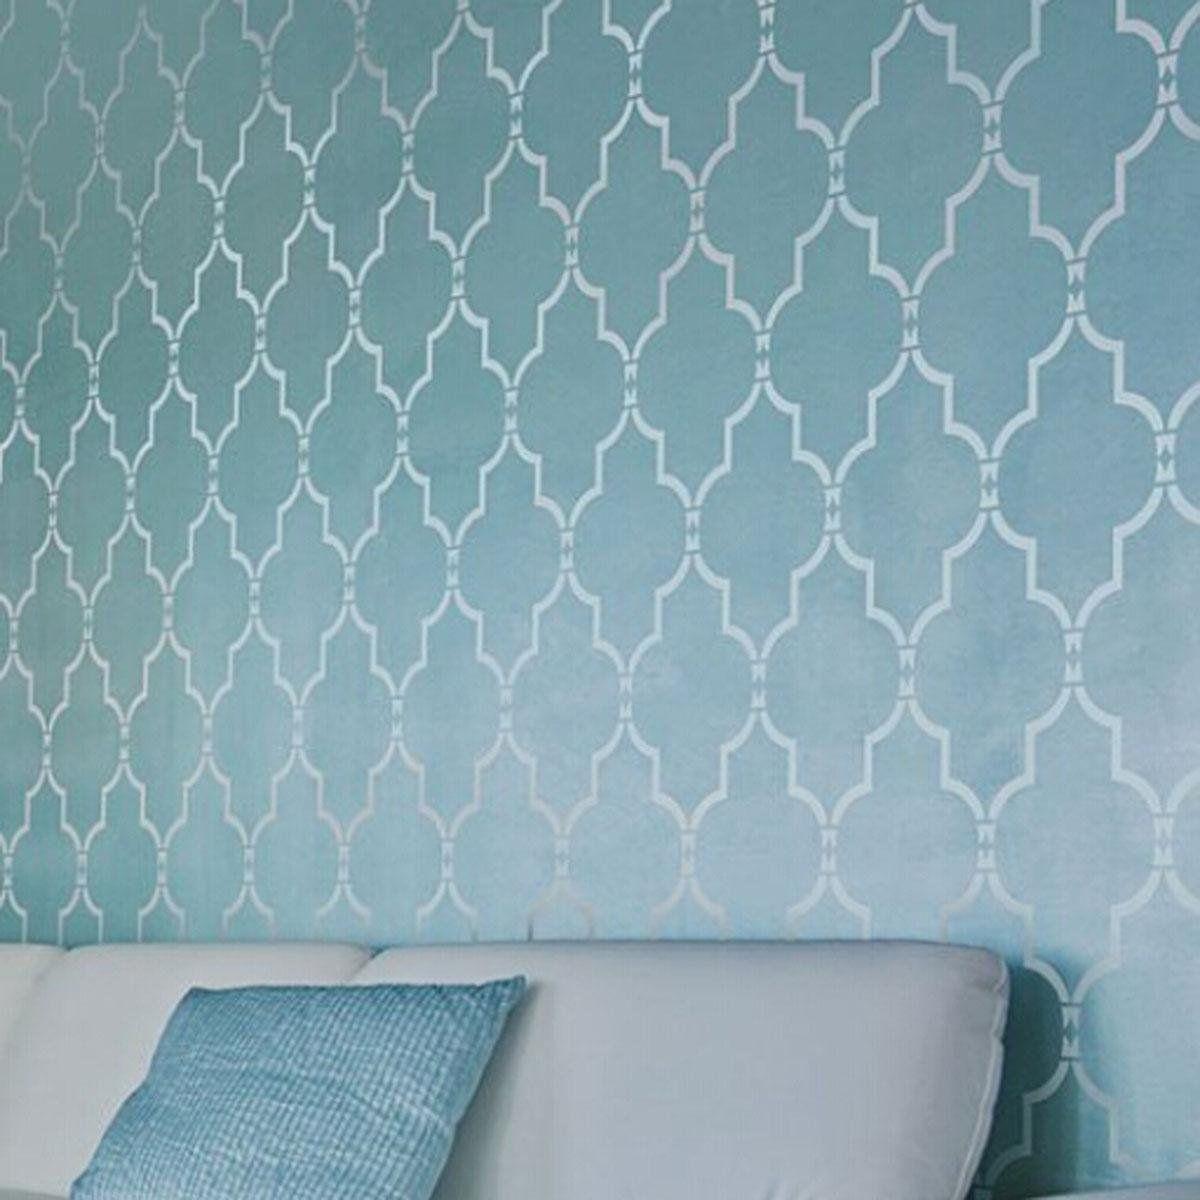 YESURPRISE® New Style Design Trellis Pattern Allover Wall Stencil ...